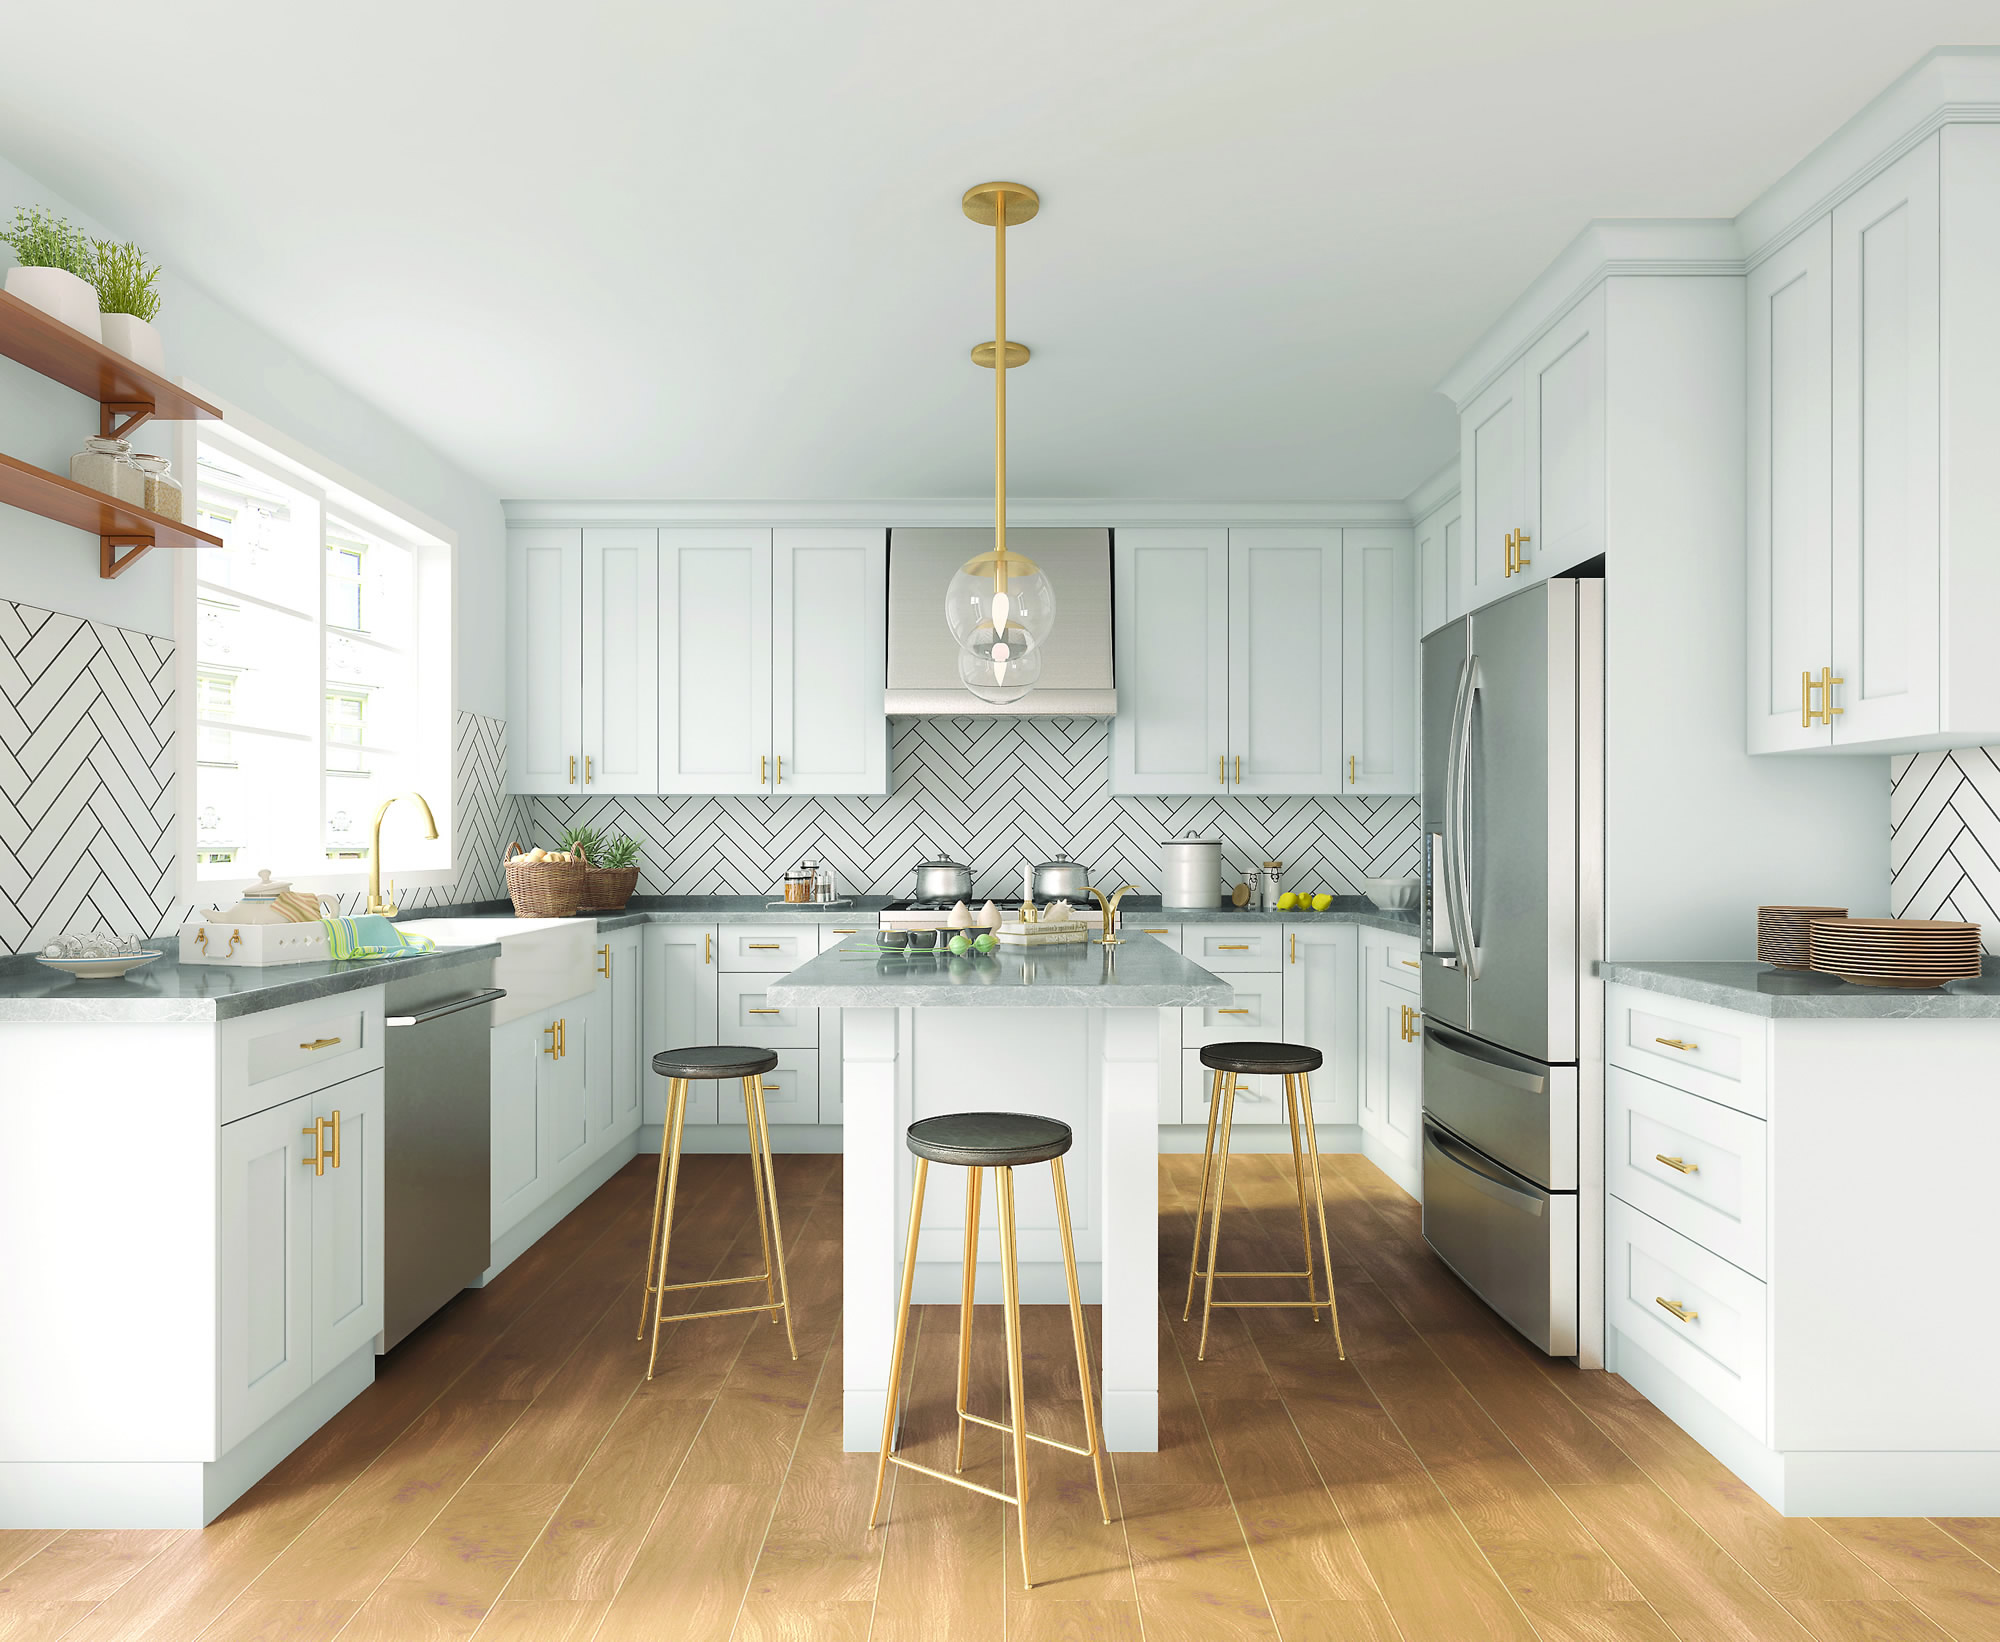 Kitchen Cabinets Tampa Shaker Kitchen Cabinets — UR Cabinets: Tampa Bay's Custom Cabi